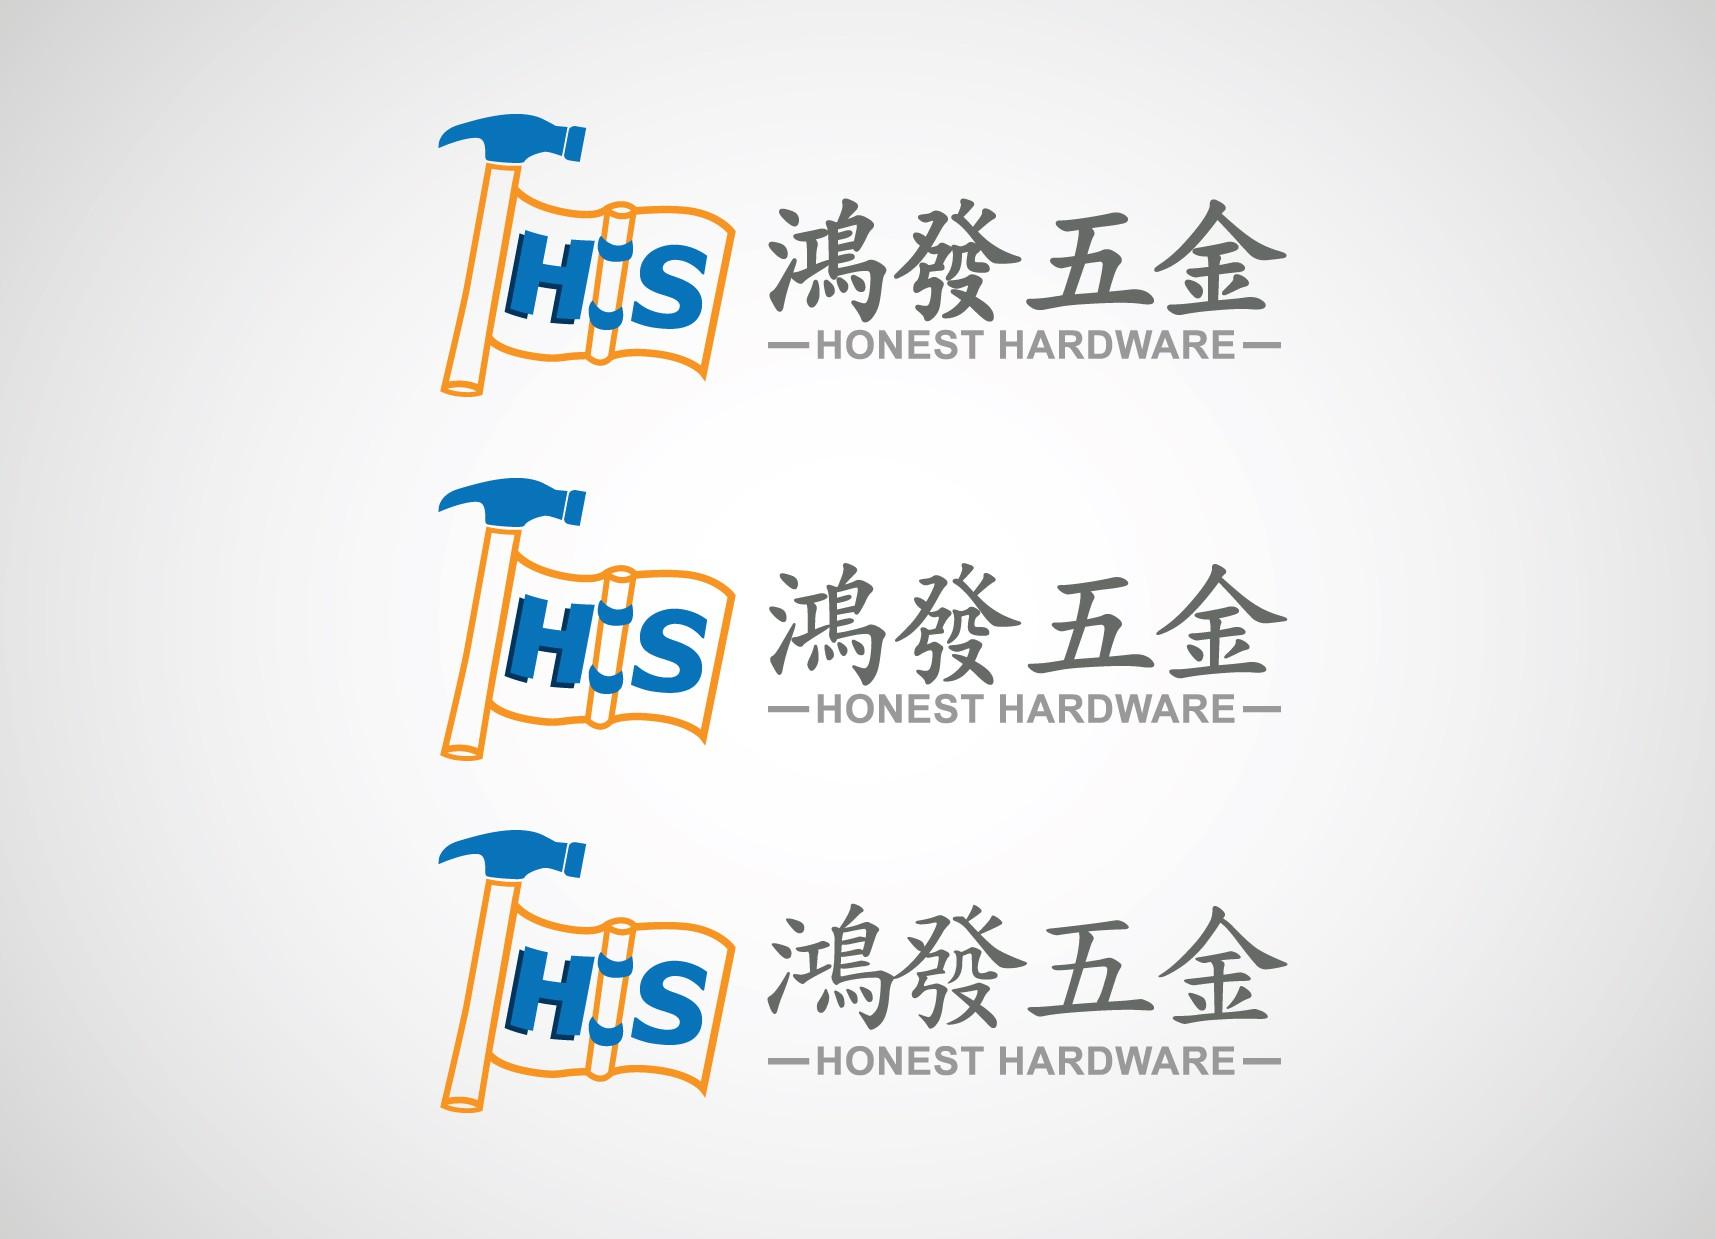 Honest Hardware needs a new logo